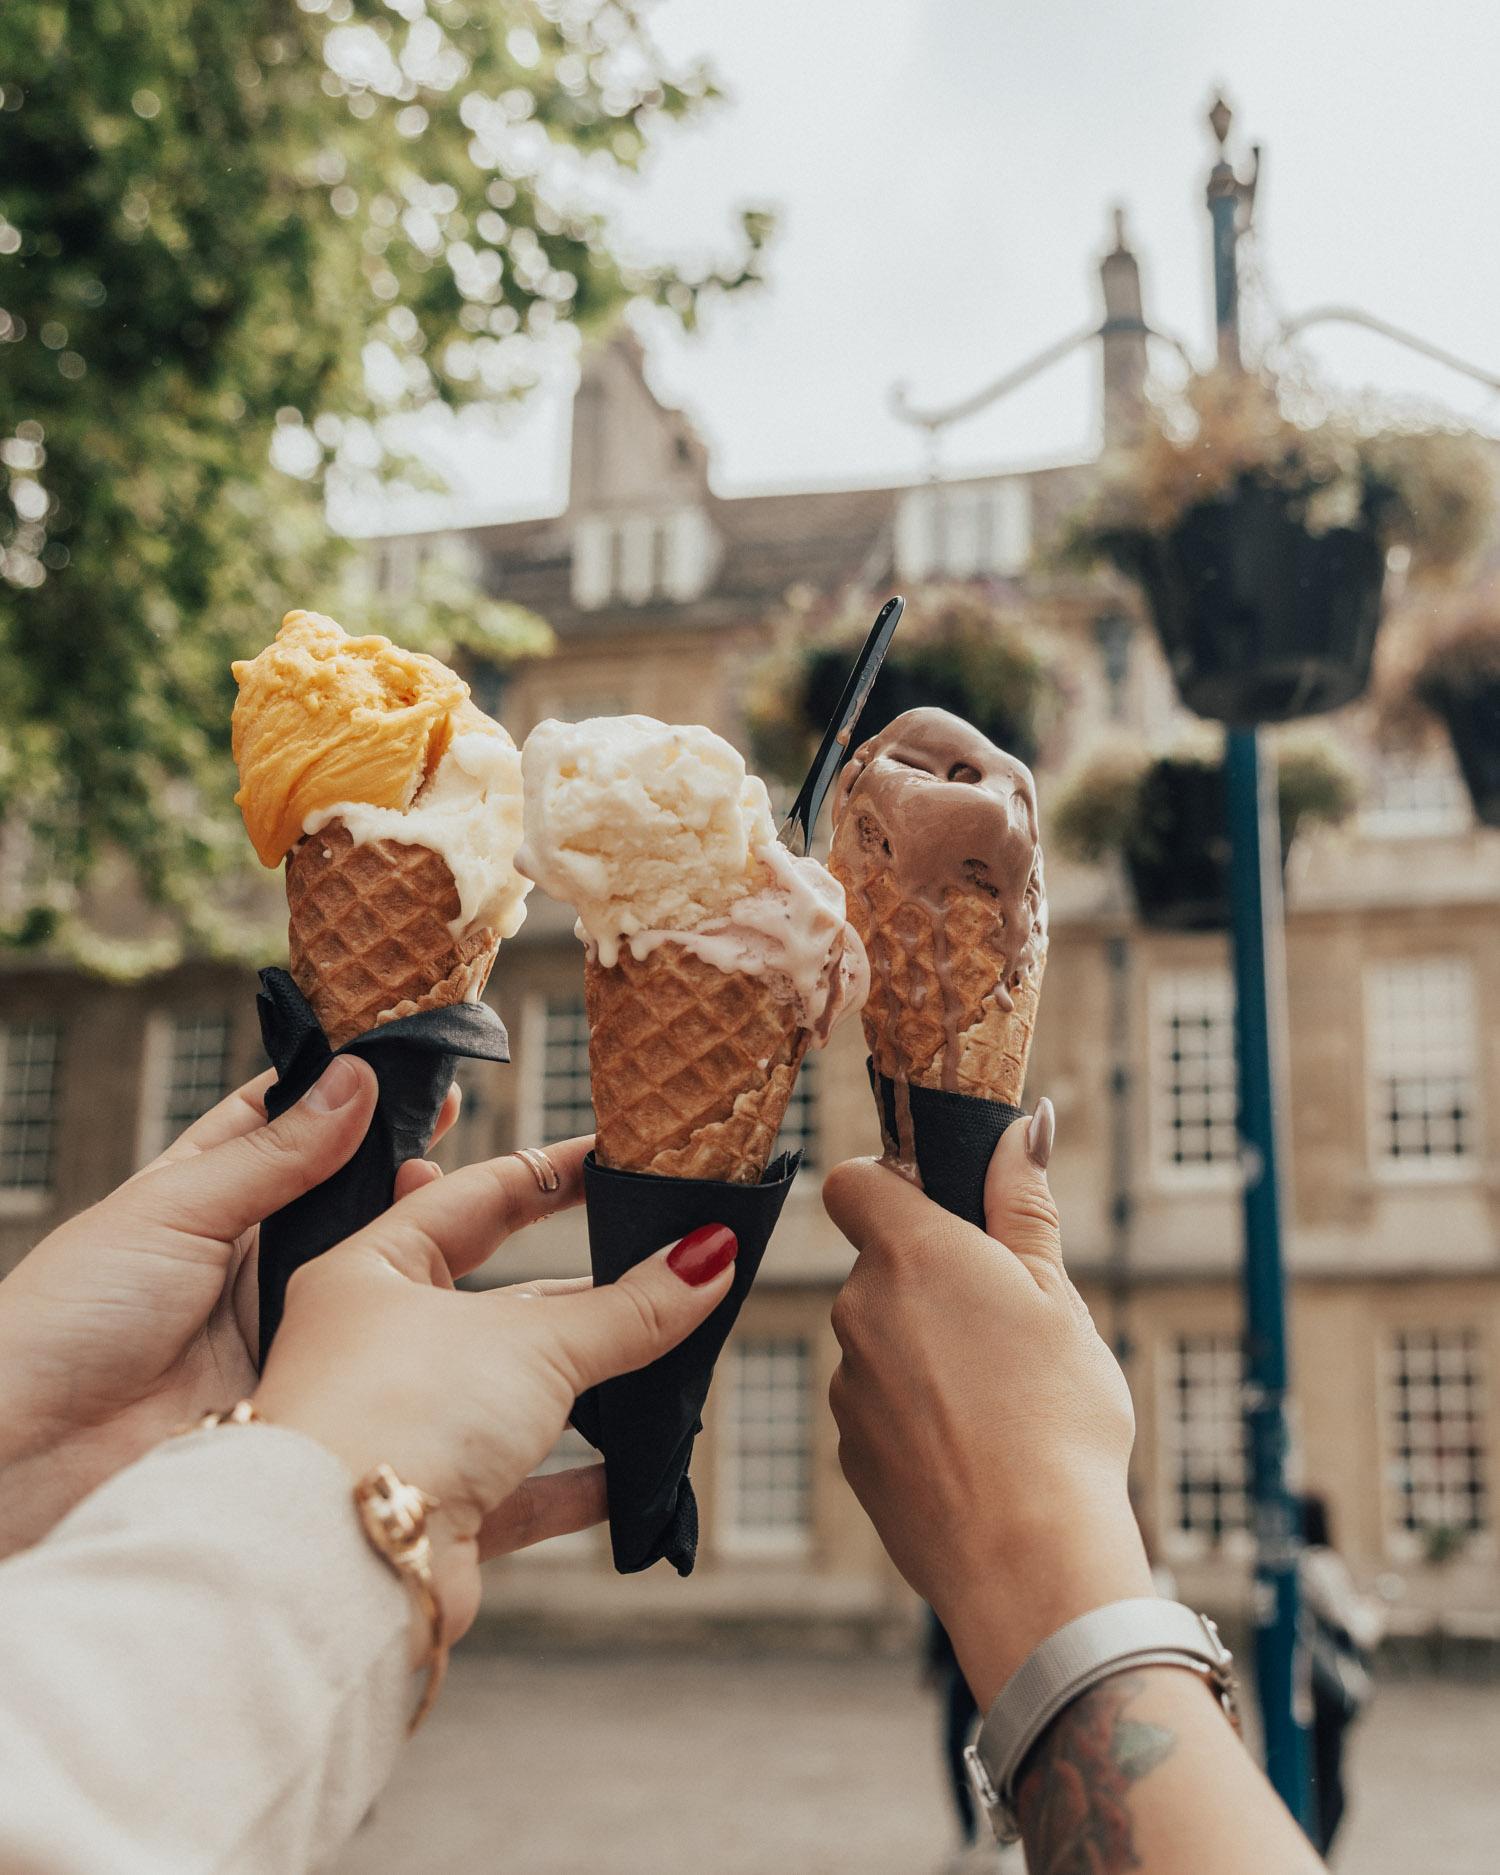 Swoon Gelato in Bath, England